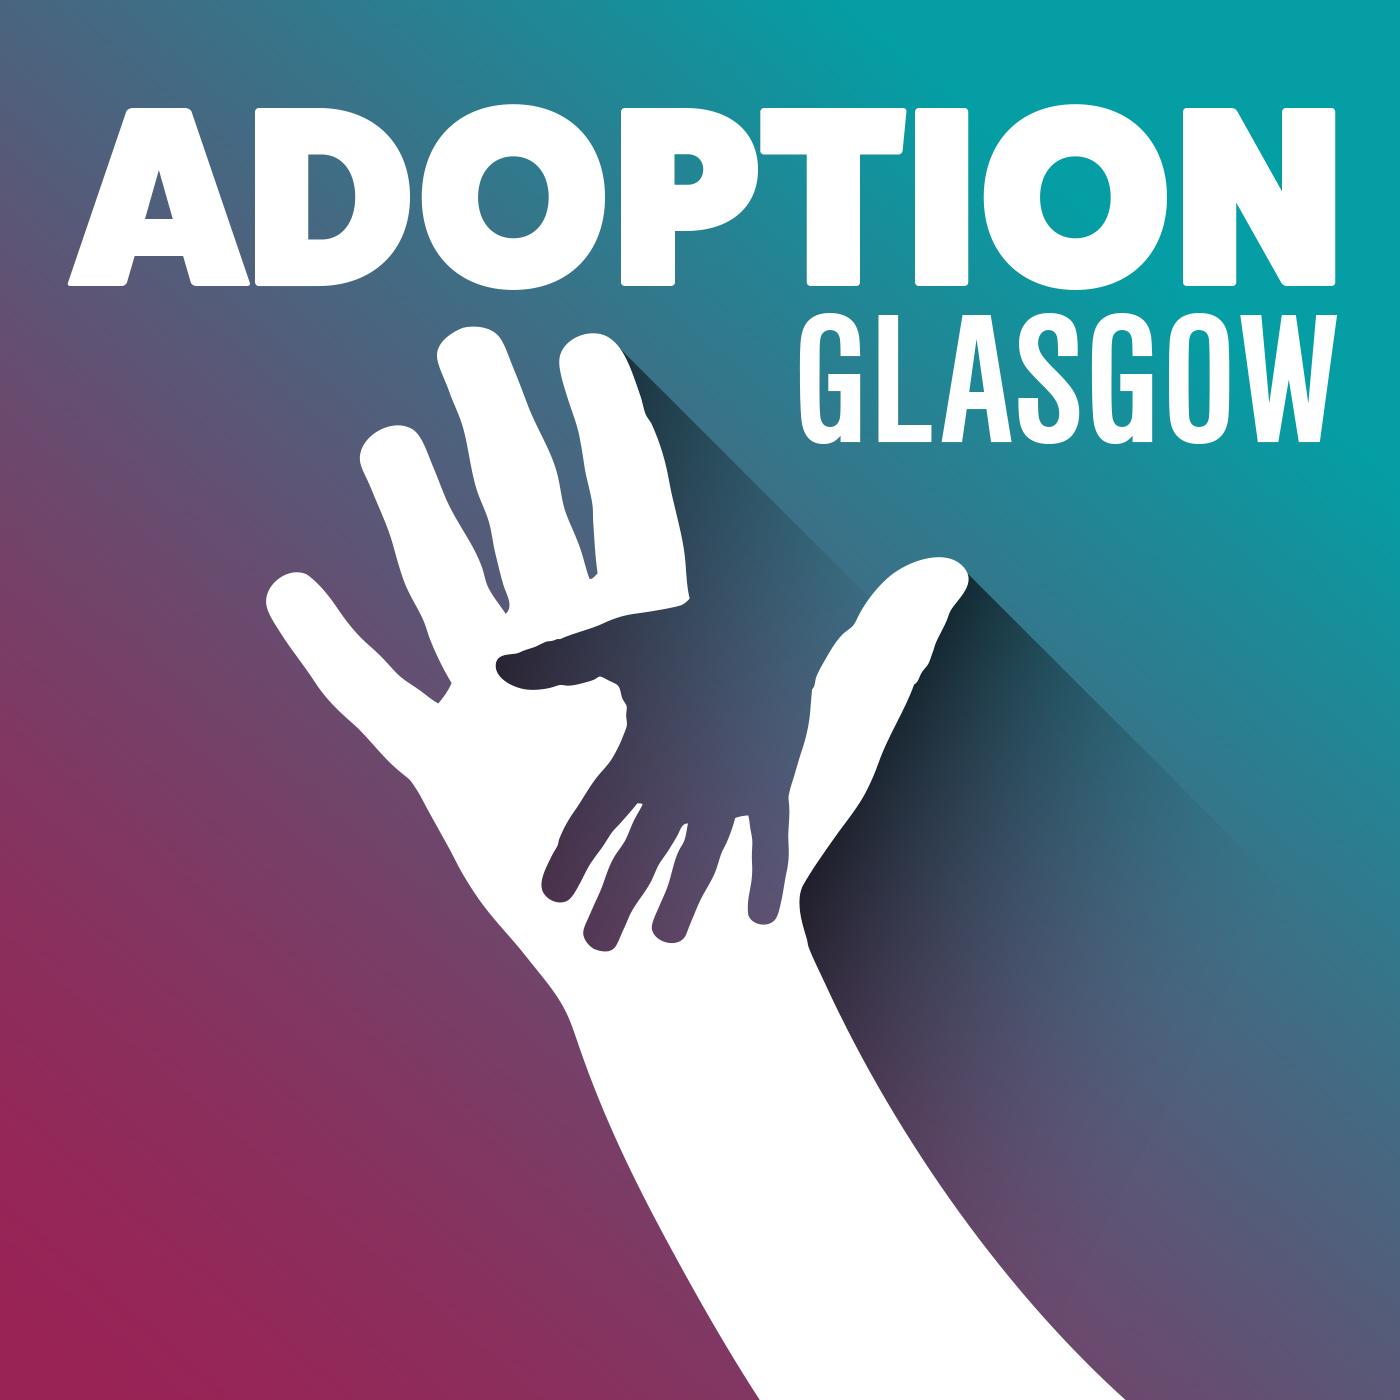 Adoption Glasgow show image